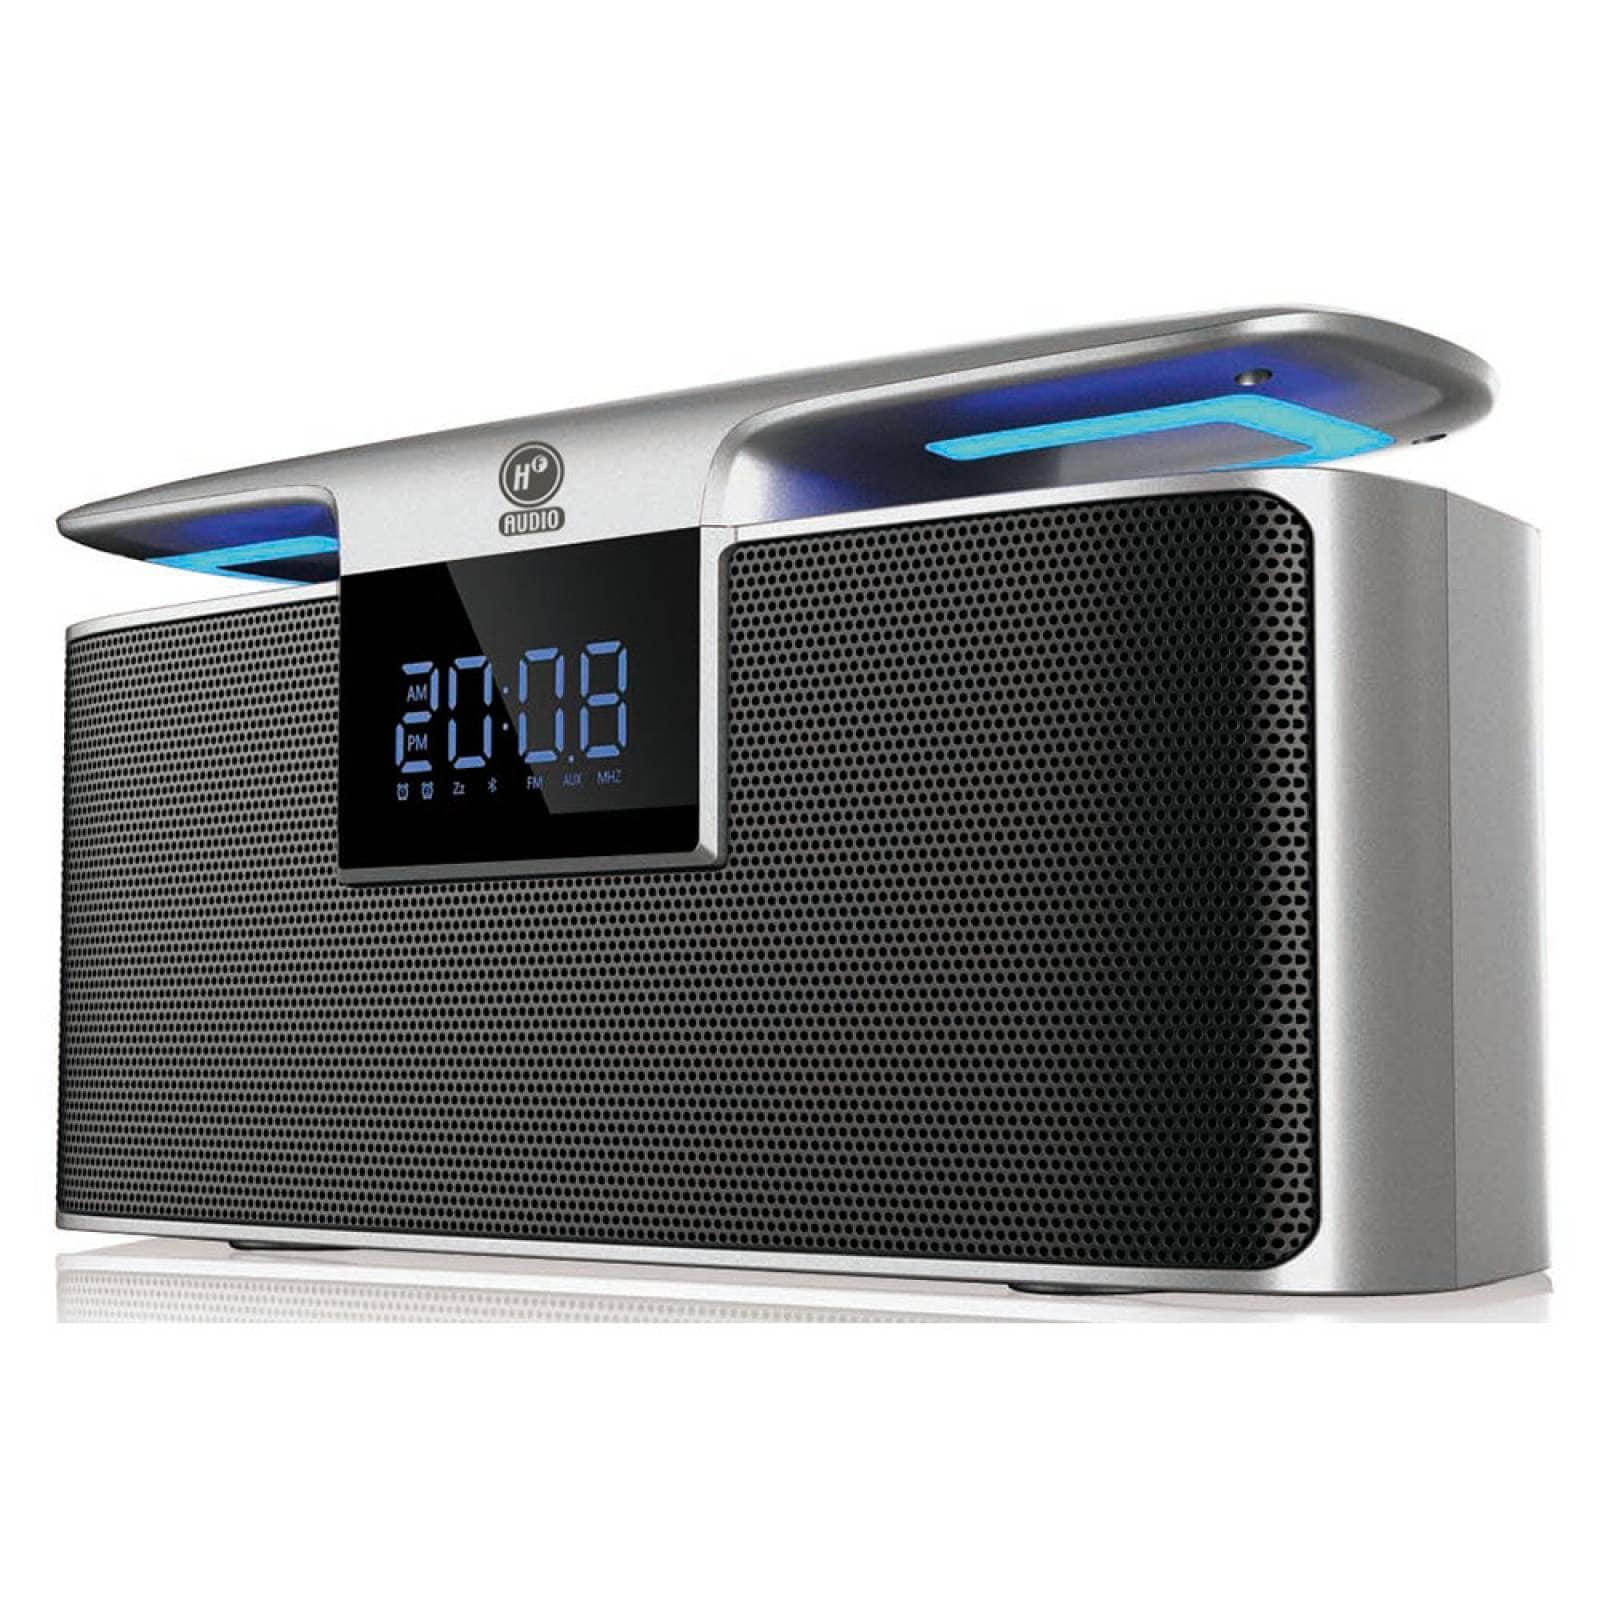 Bocina Bluetooth Con Reloj Despertador Mp3 Usb Sd Hf-clock50